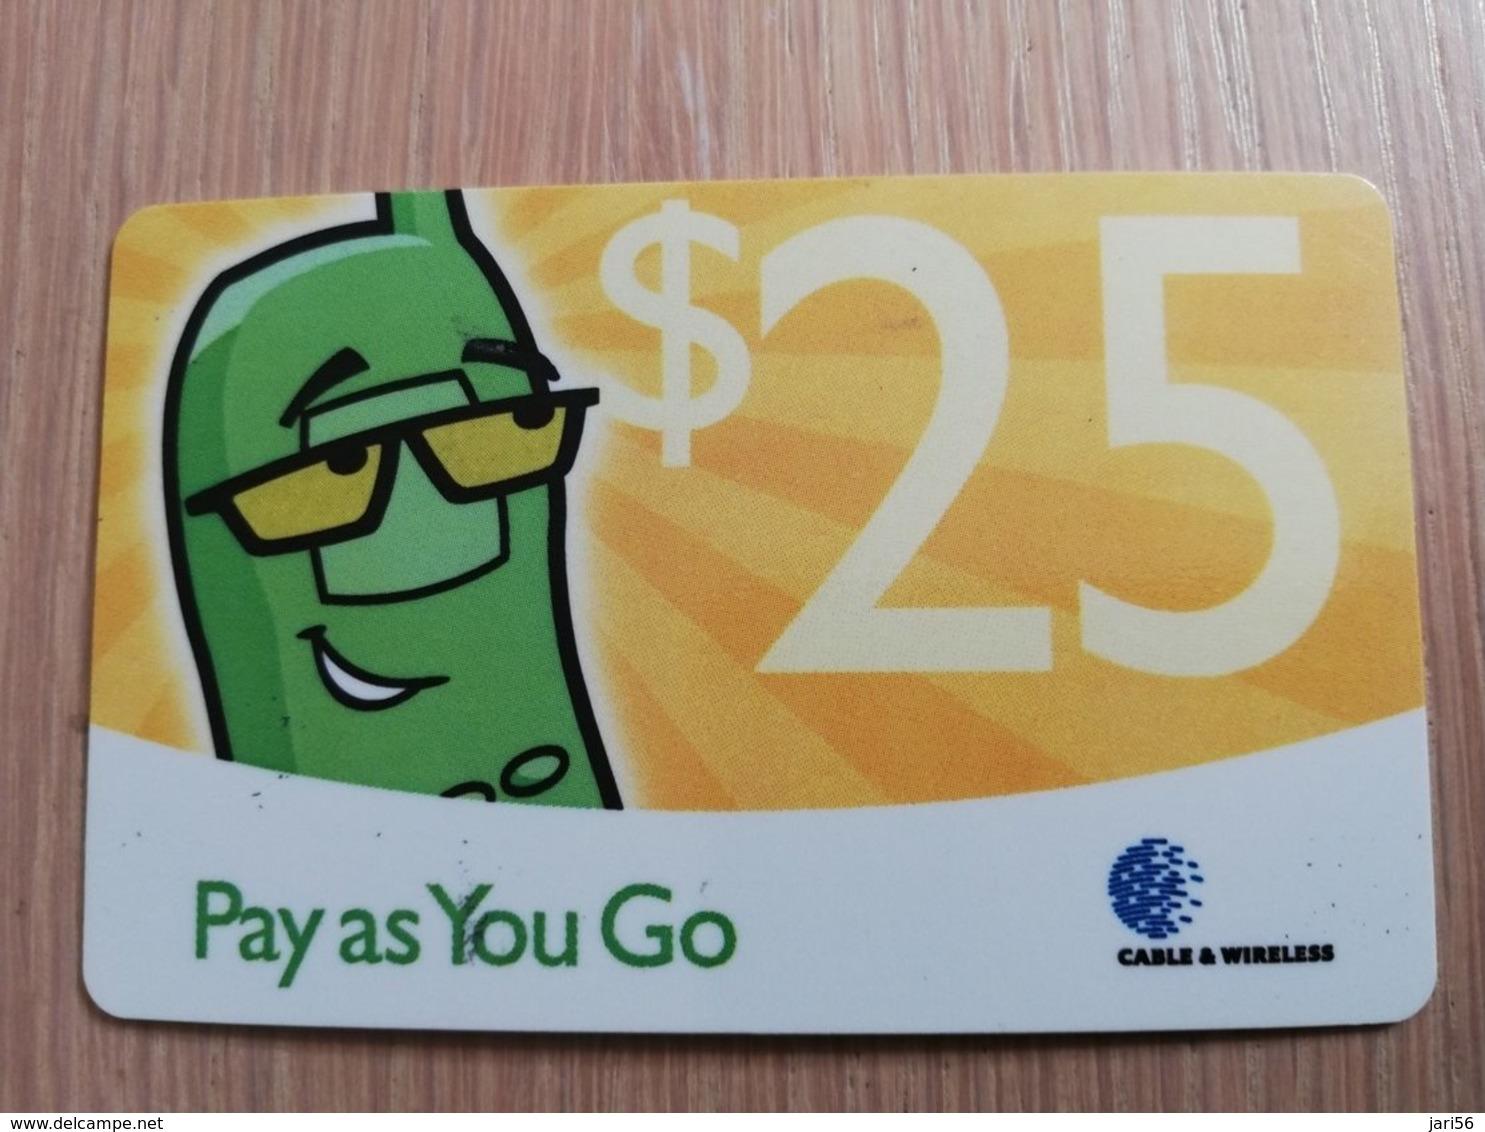 CAYMAN ISLANDS  $25,- PAY AS YOU GO YELLOW  Prepaid  Fine Used Card  ** 2085 ** - Iles Cayman